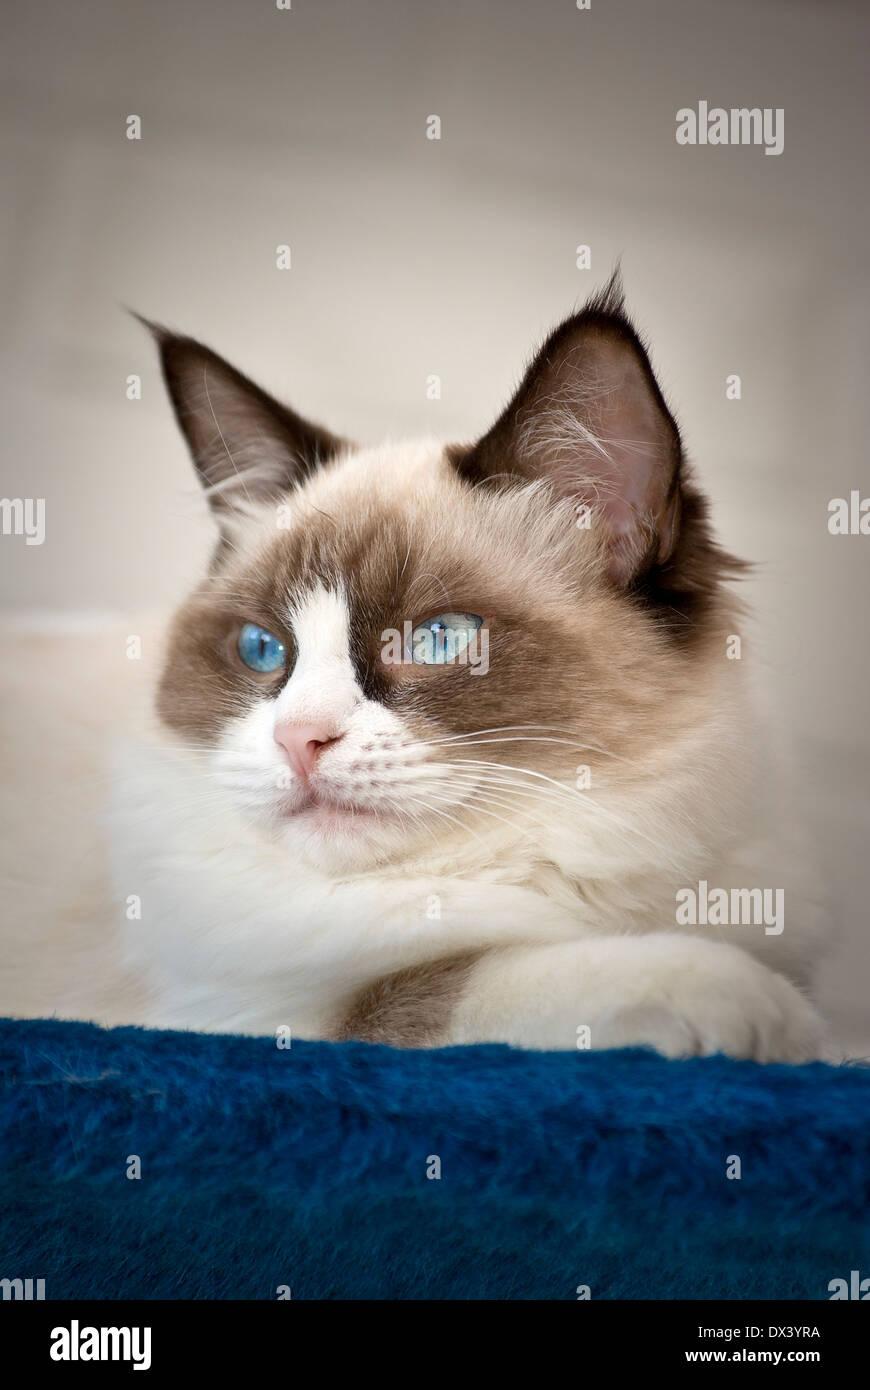 Young Ragdoll cat alert indoors - Stock Image